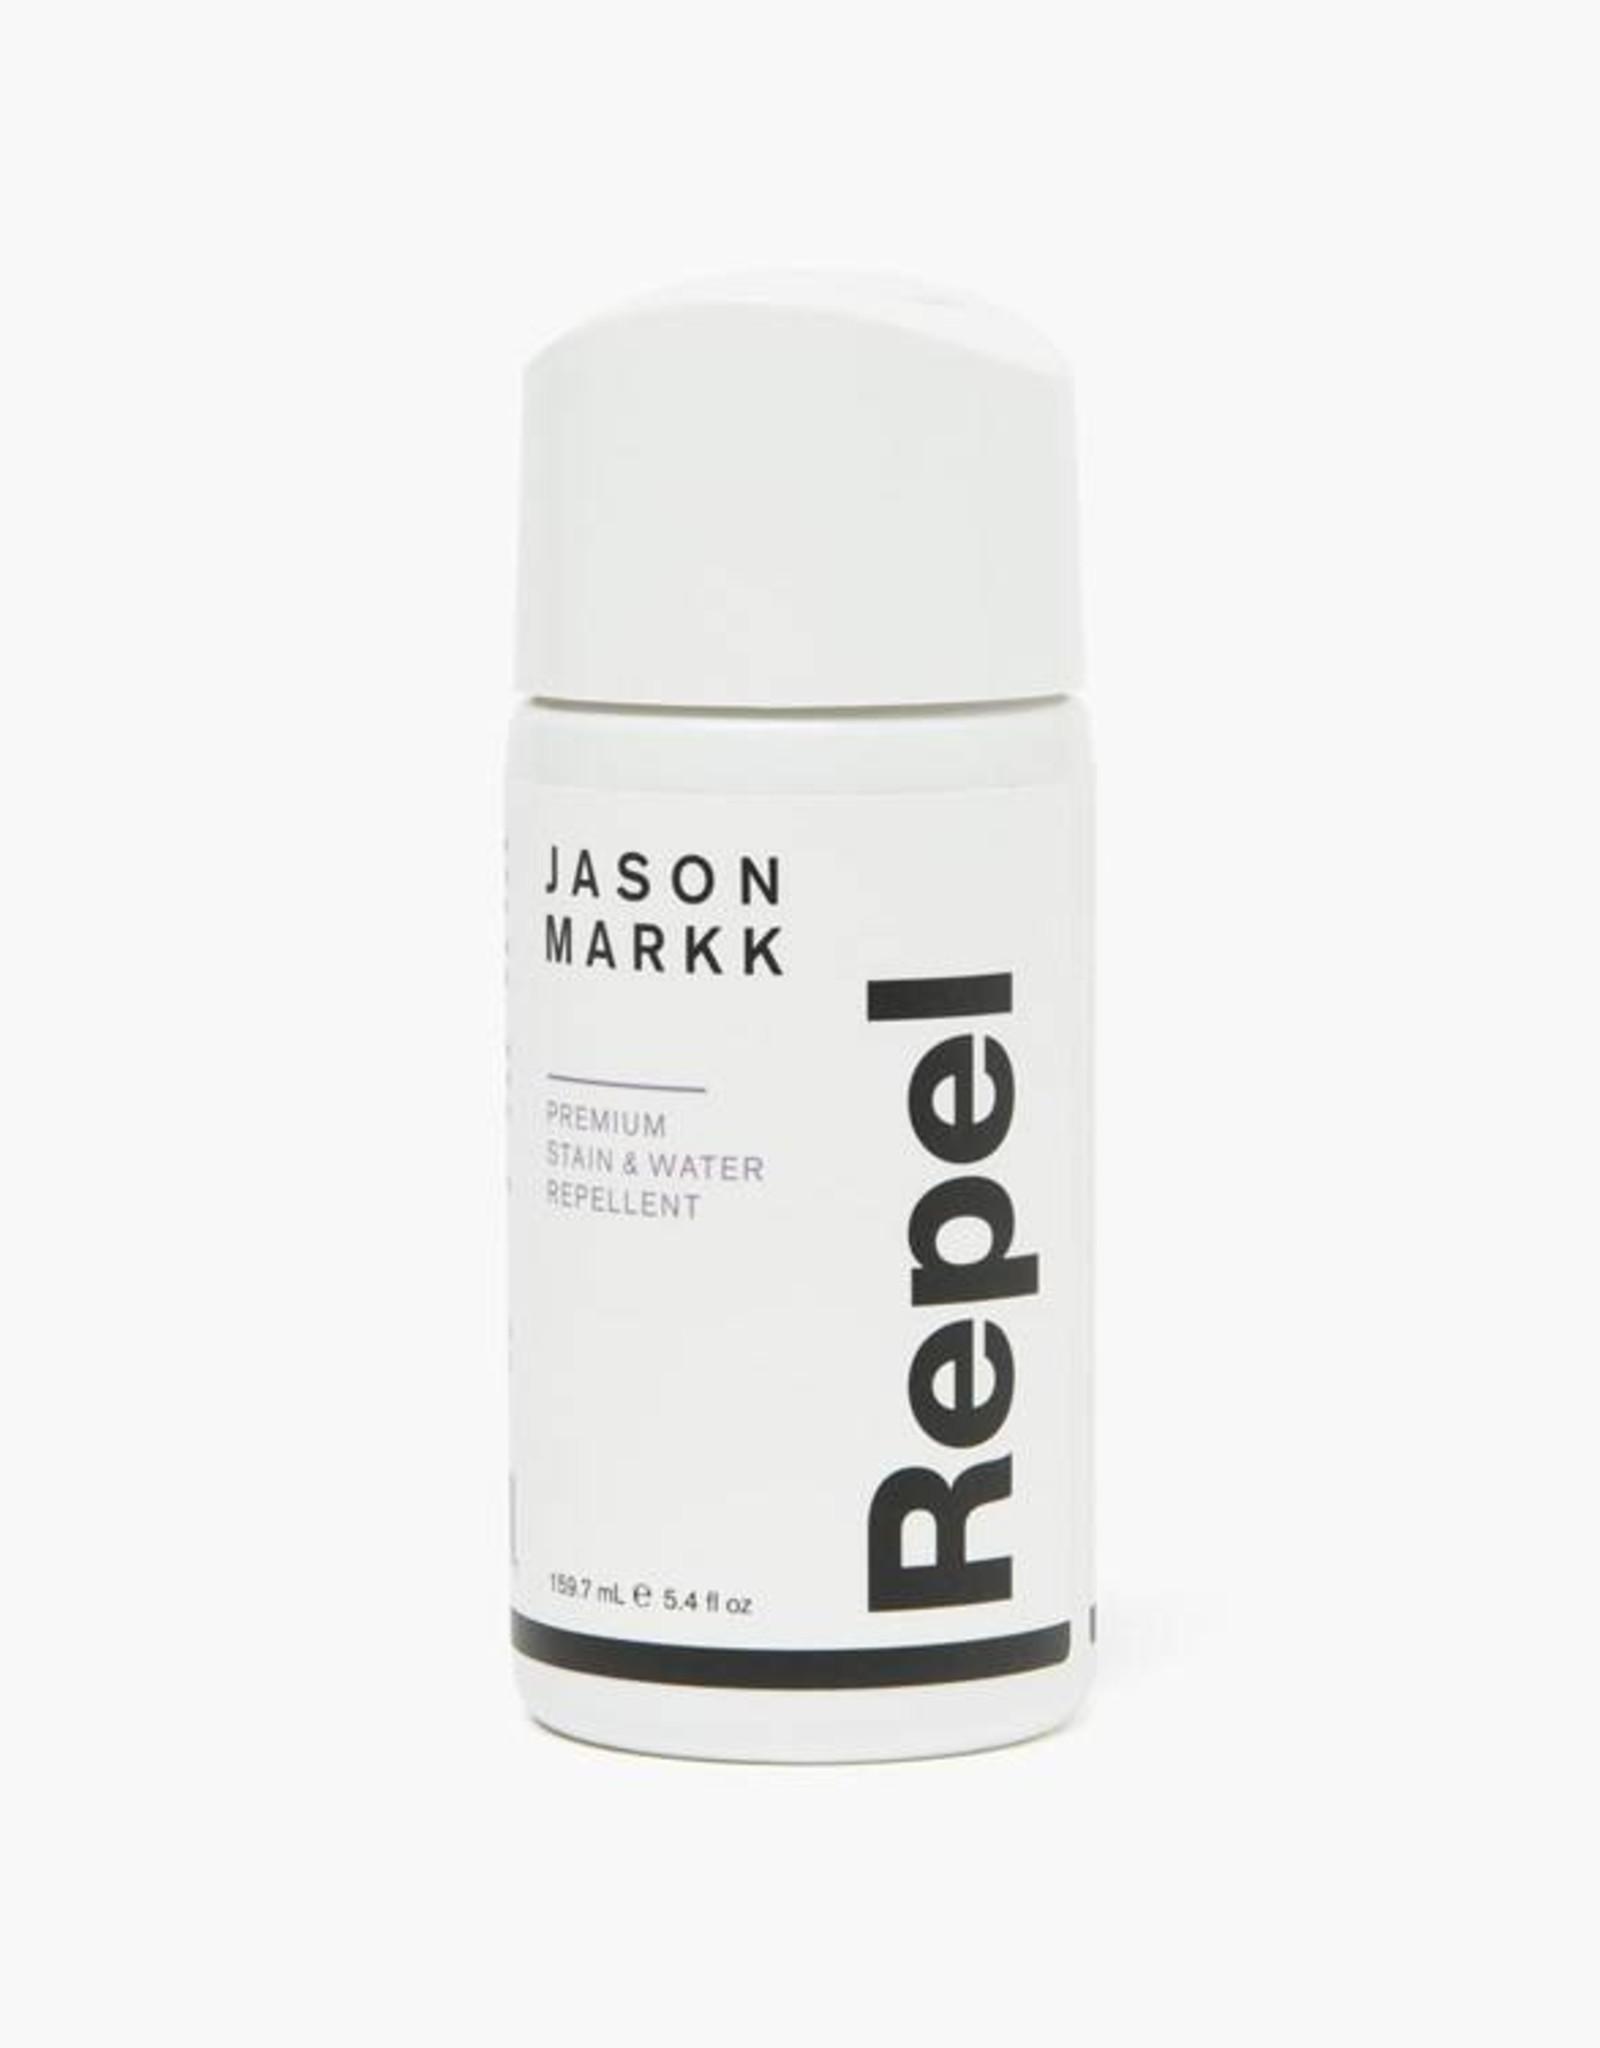 JASON MARKK  REFILL BOTTLE